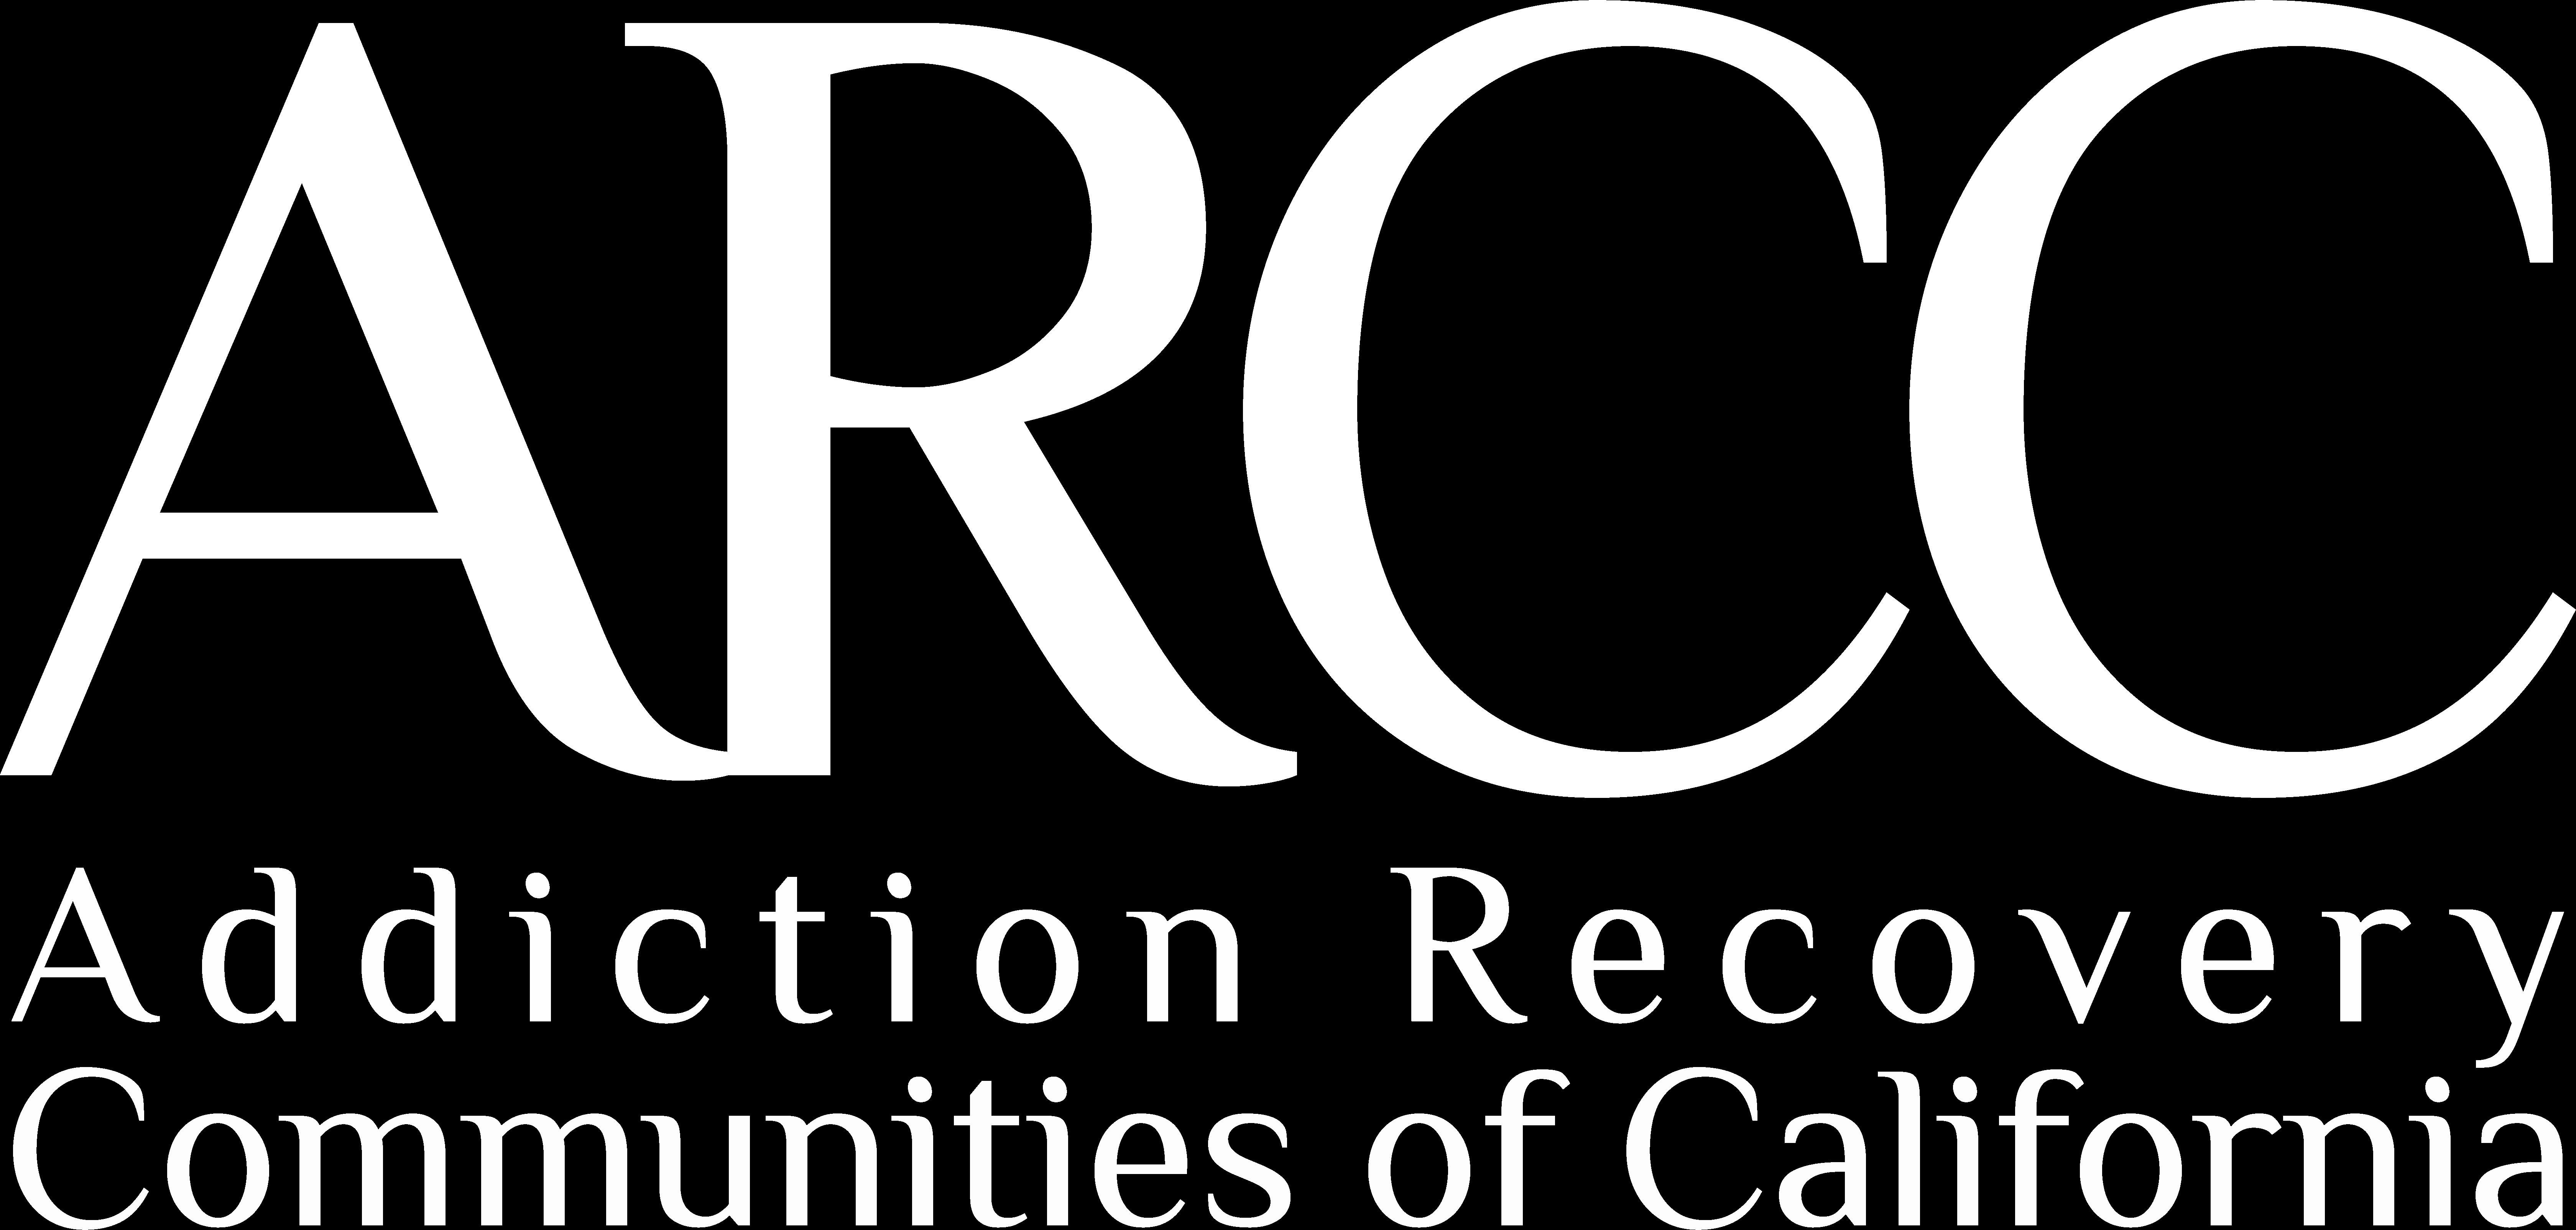 Addiction Recovery Communities of California